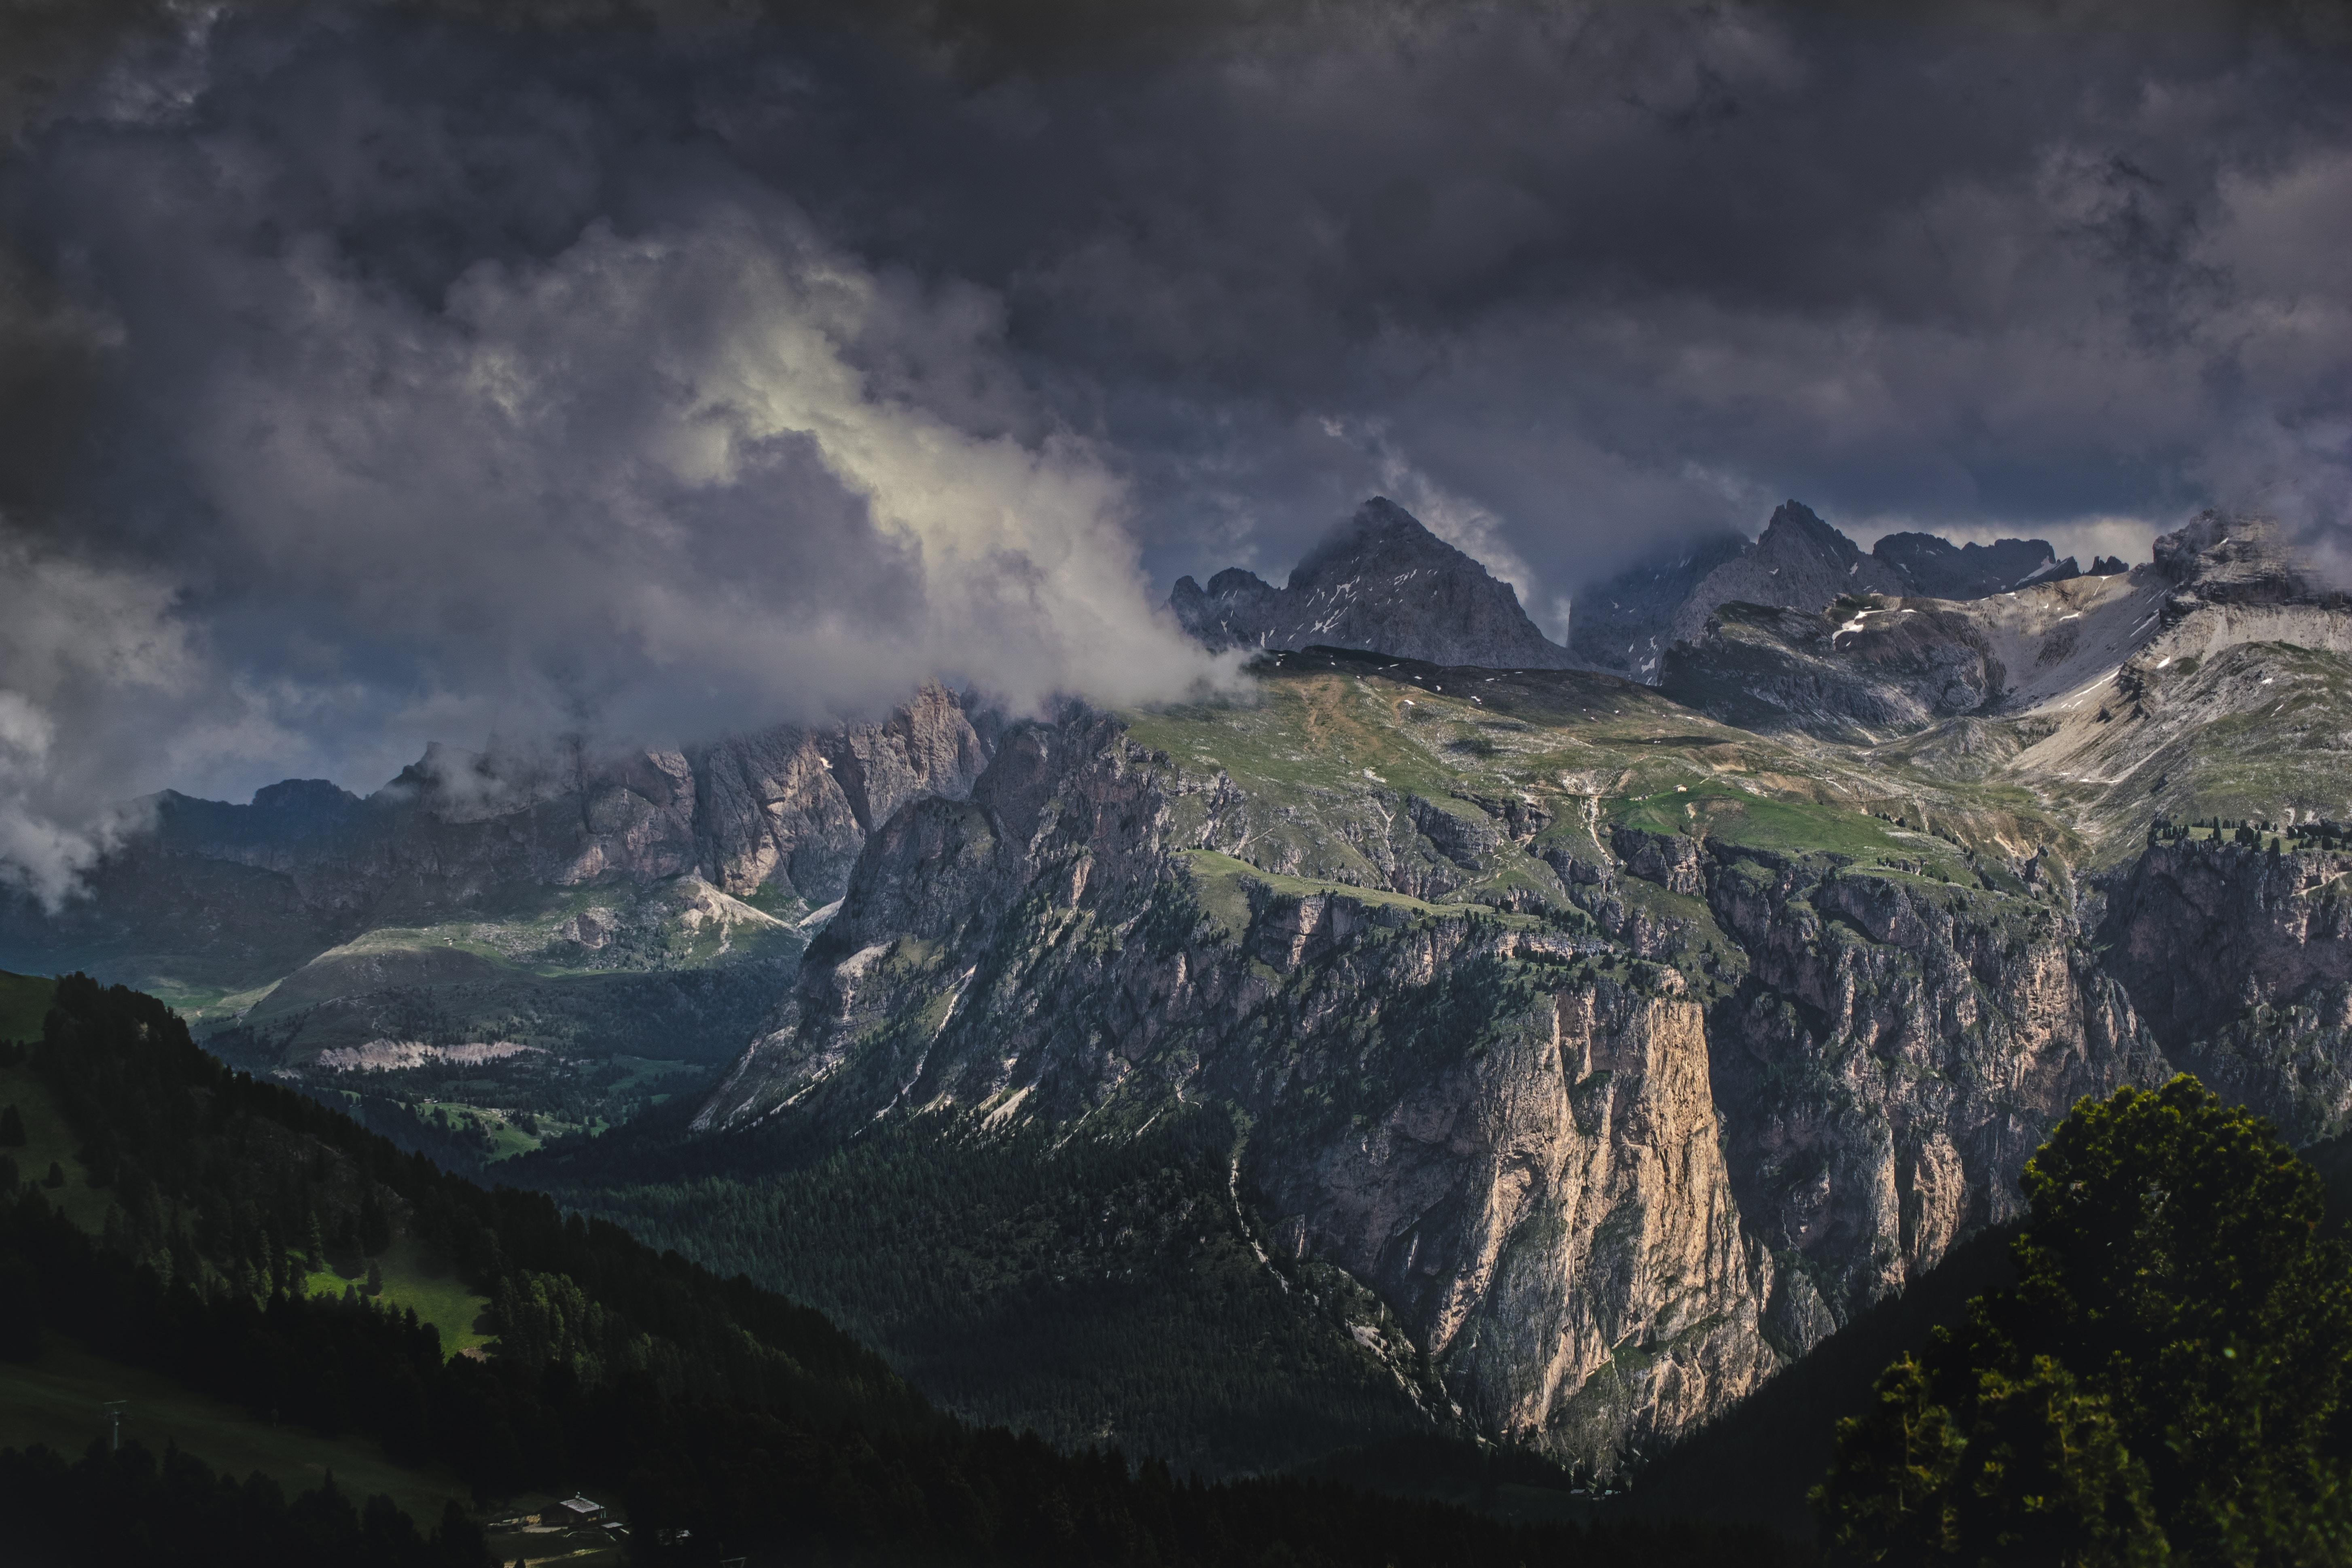 bird's eye view of mountains under nimbus cumulus clouds